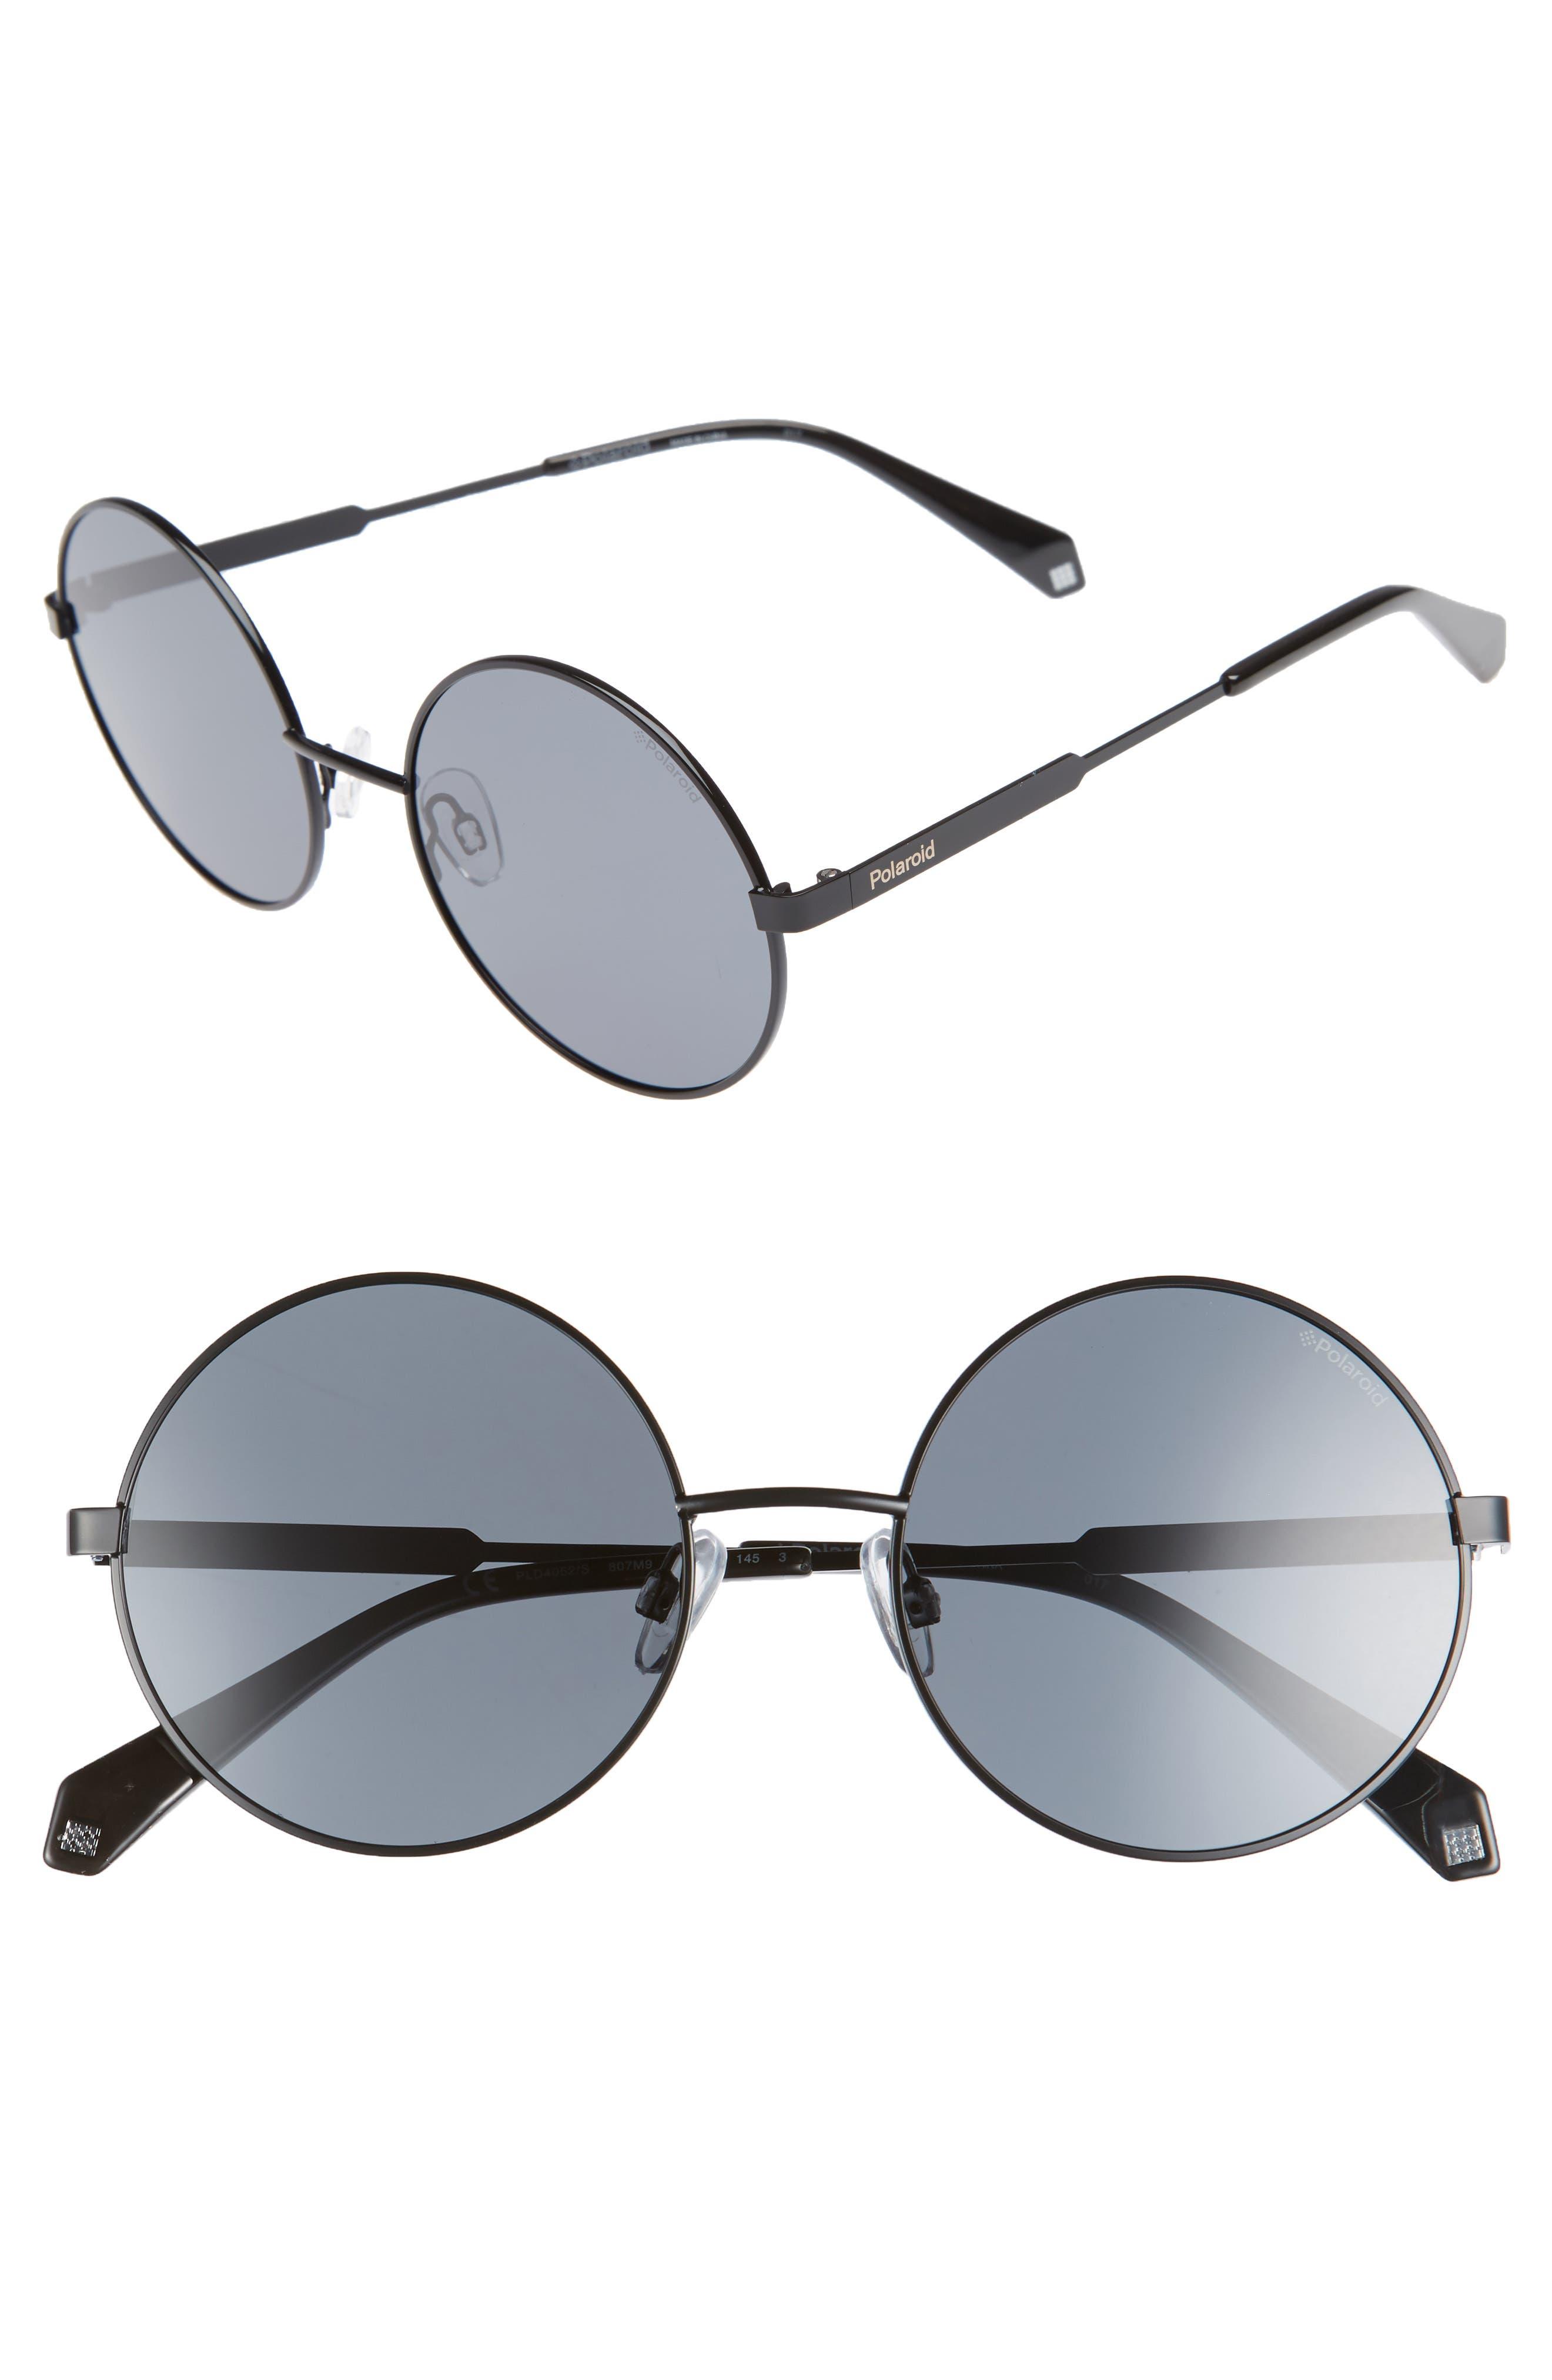 55mm Polarized Round Sunglasses,                         Main,                         color, Black